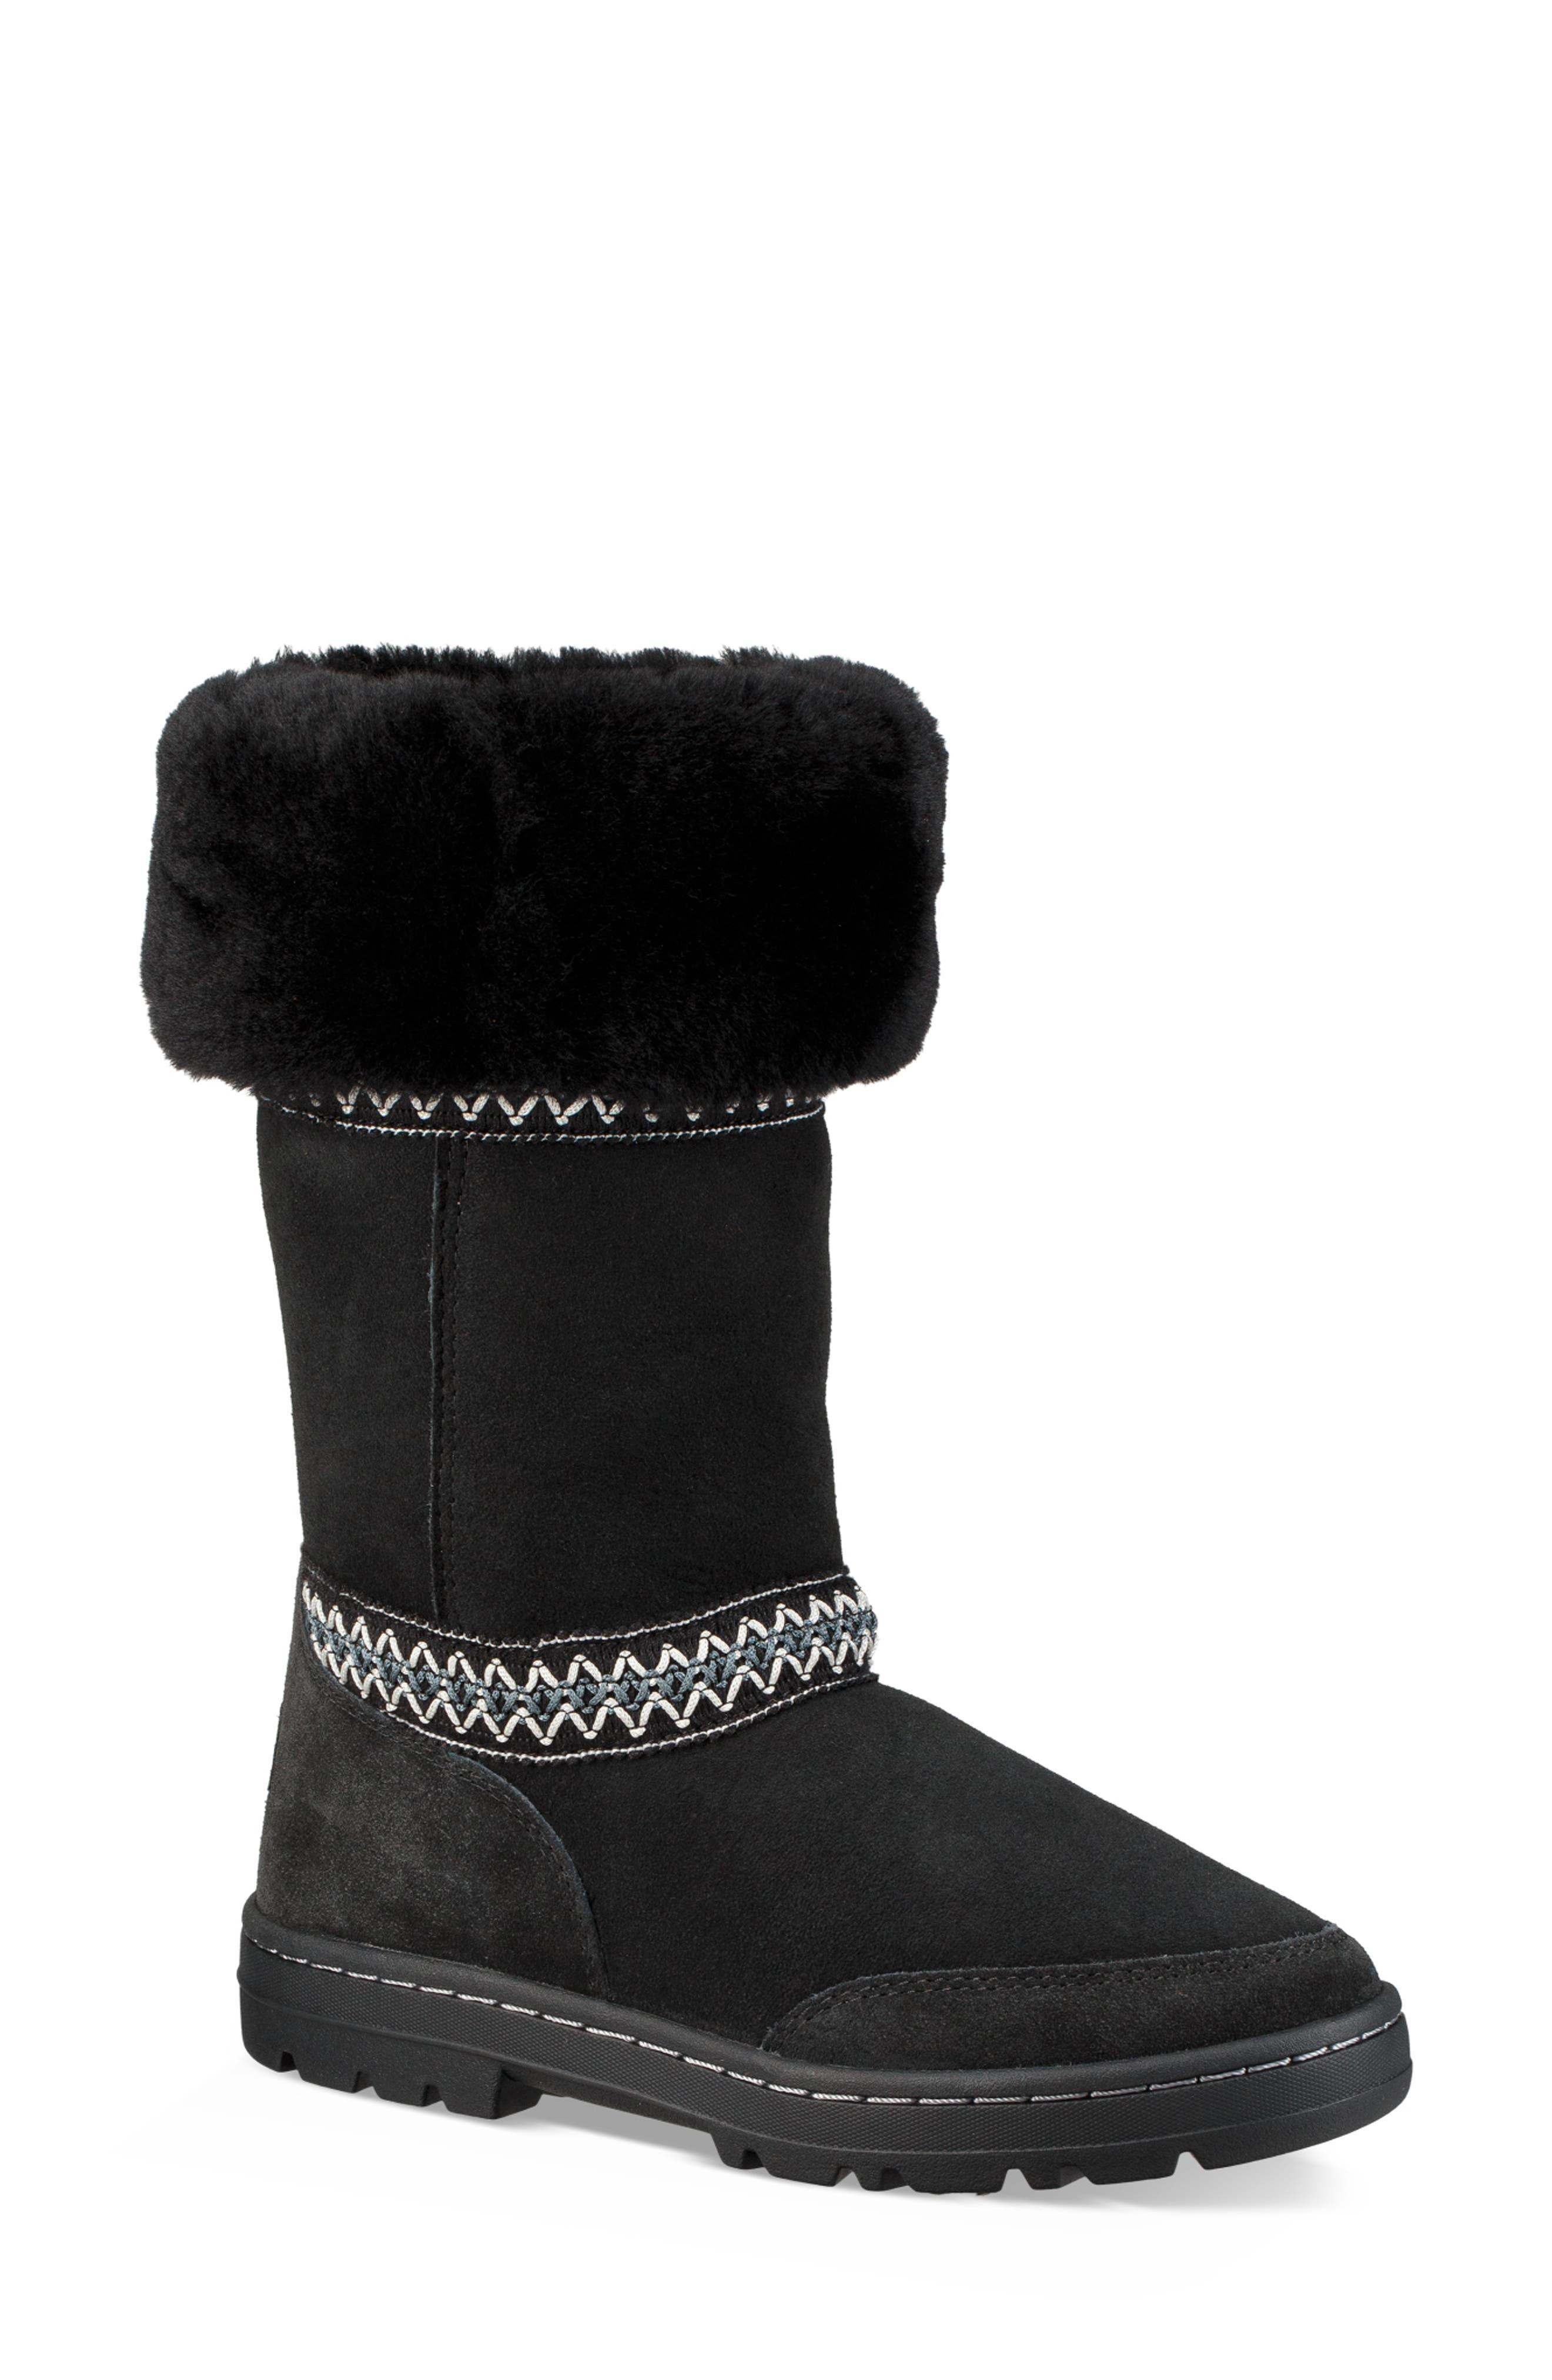 Sundance Revival Genuine Shearling Boot,                             Alternate thumbnail 2, color,                             BLACK